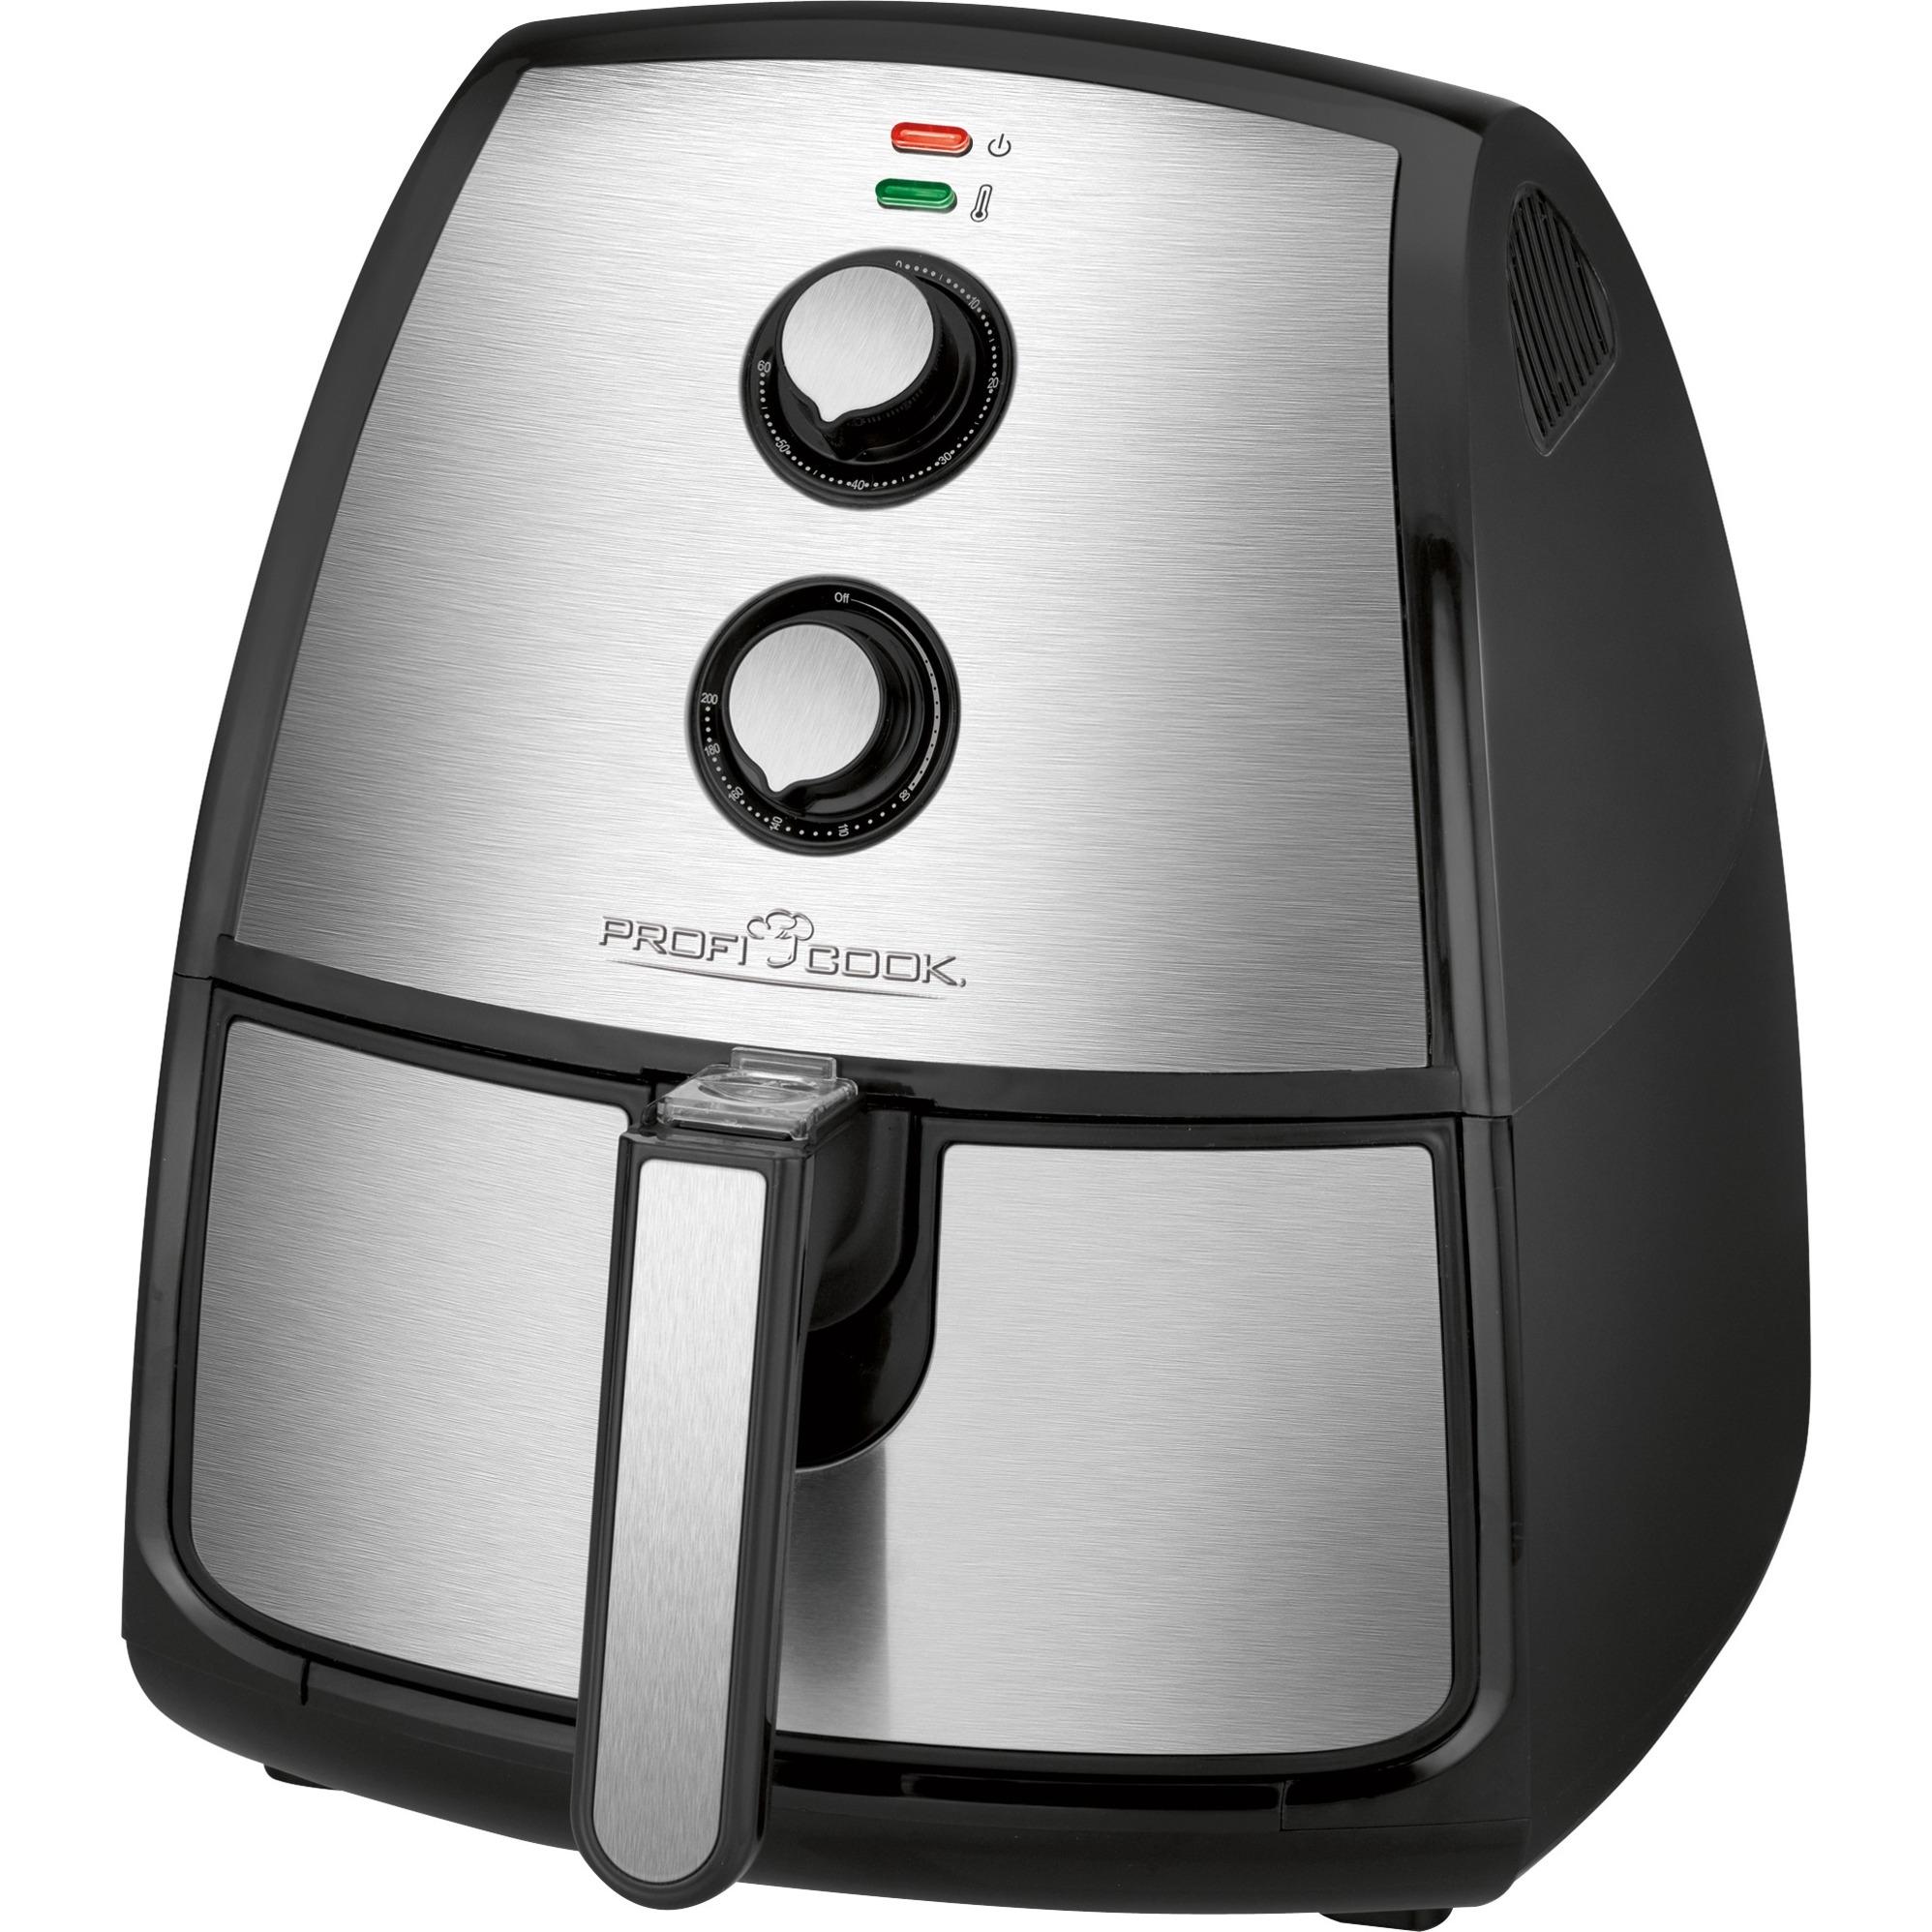 PC-FR 1115 H, Freidora